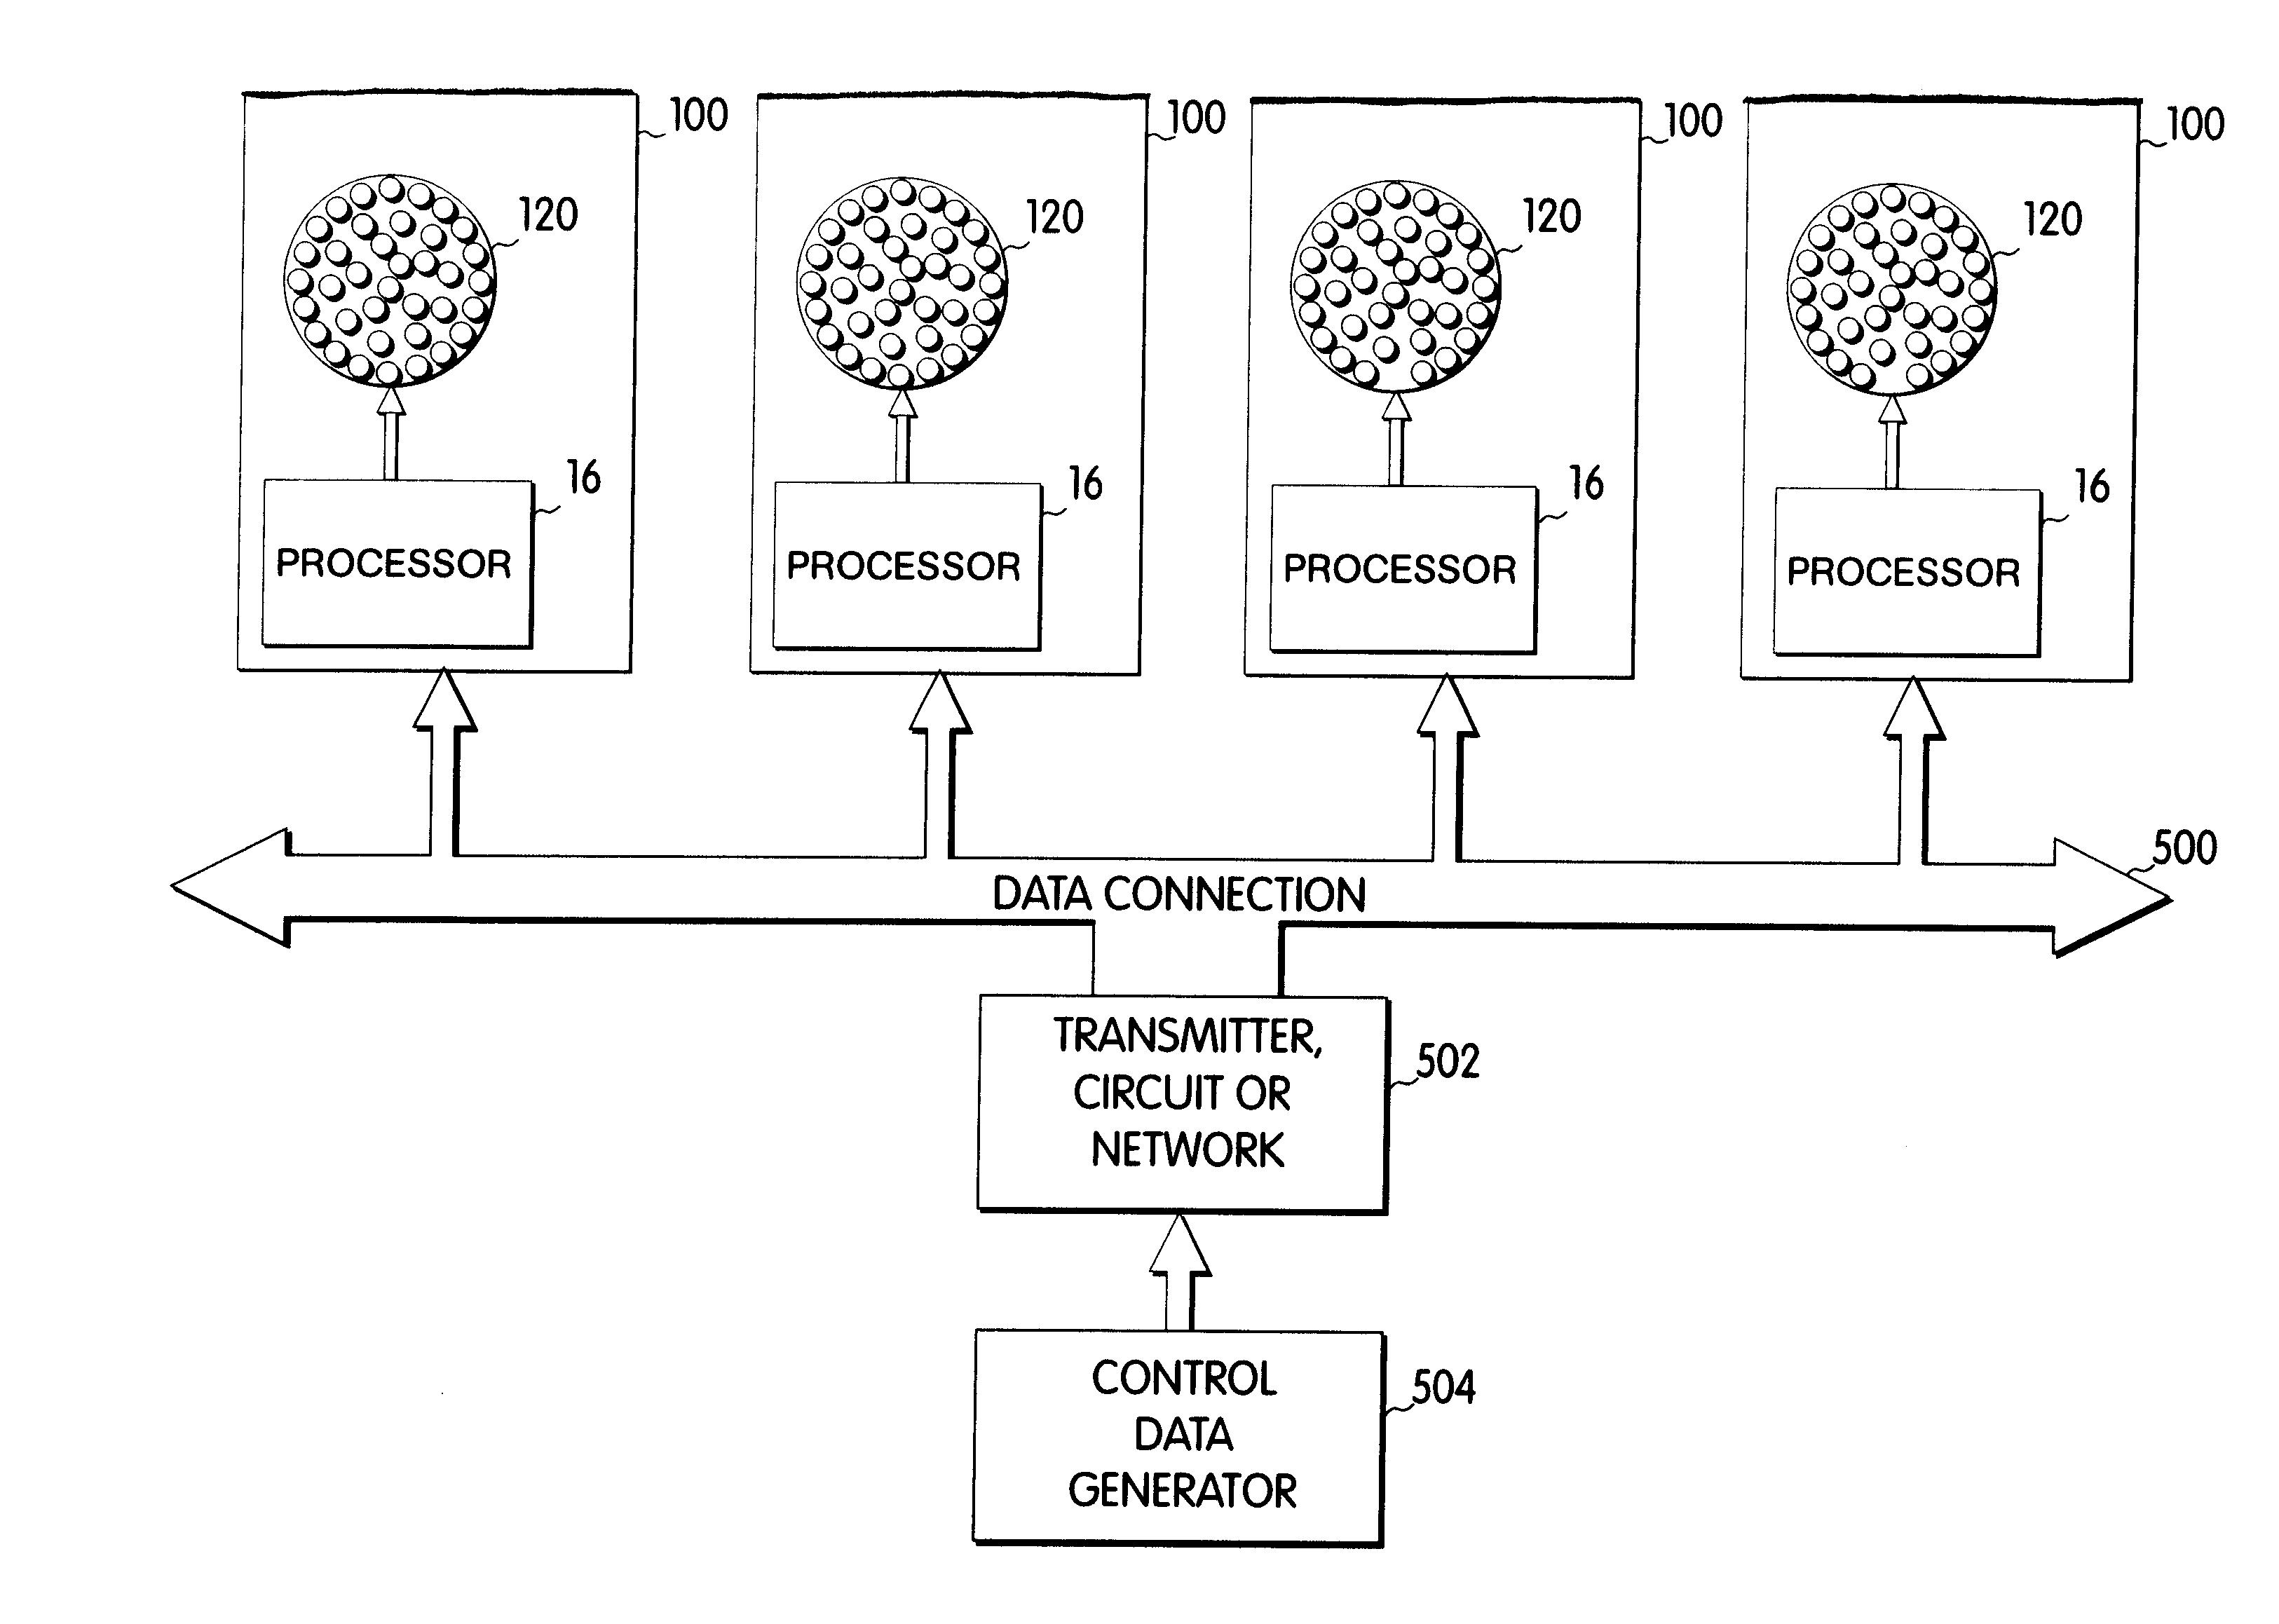 Patent US 6,292,901 B1 on